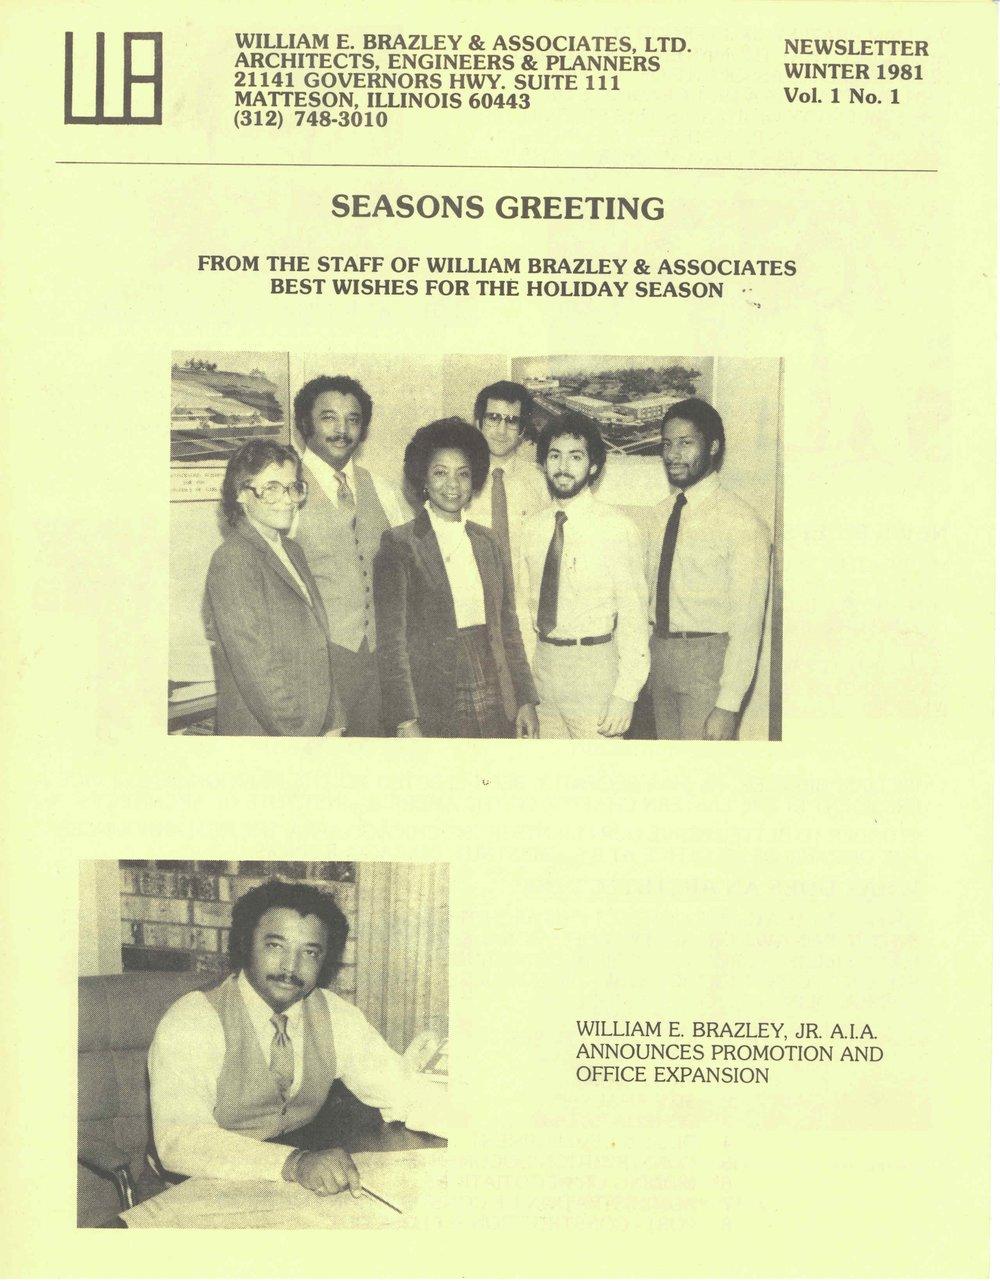 1981 - Williams Brazley & Associates Holiday Card